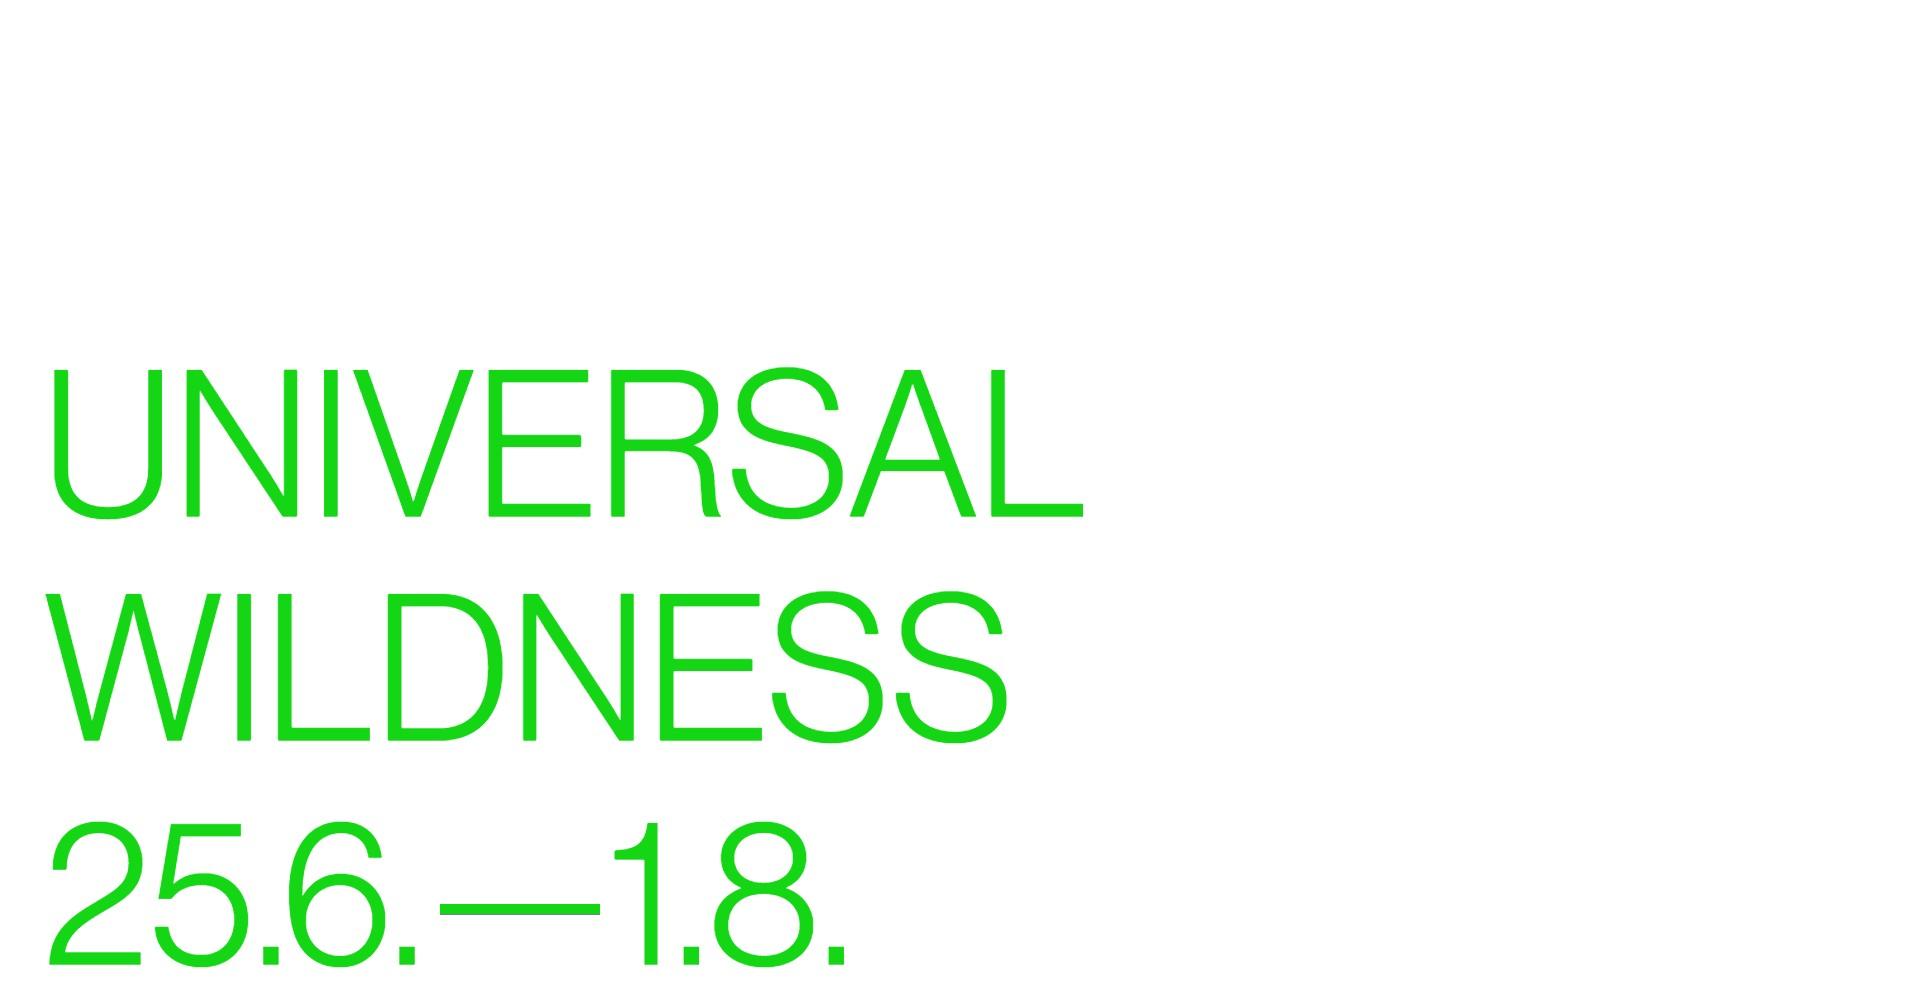 Universal Wildness